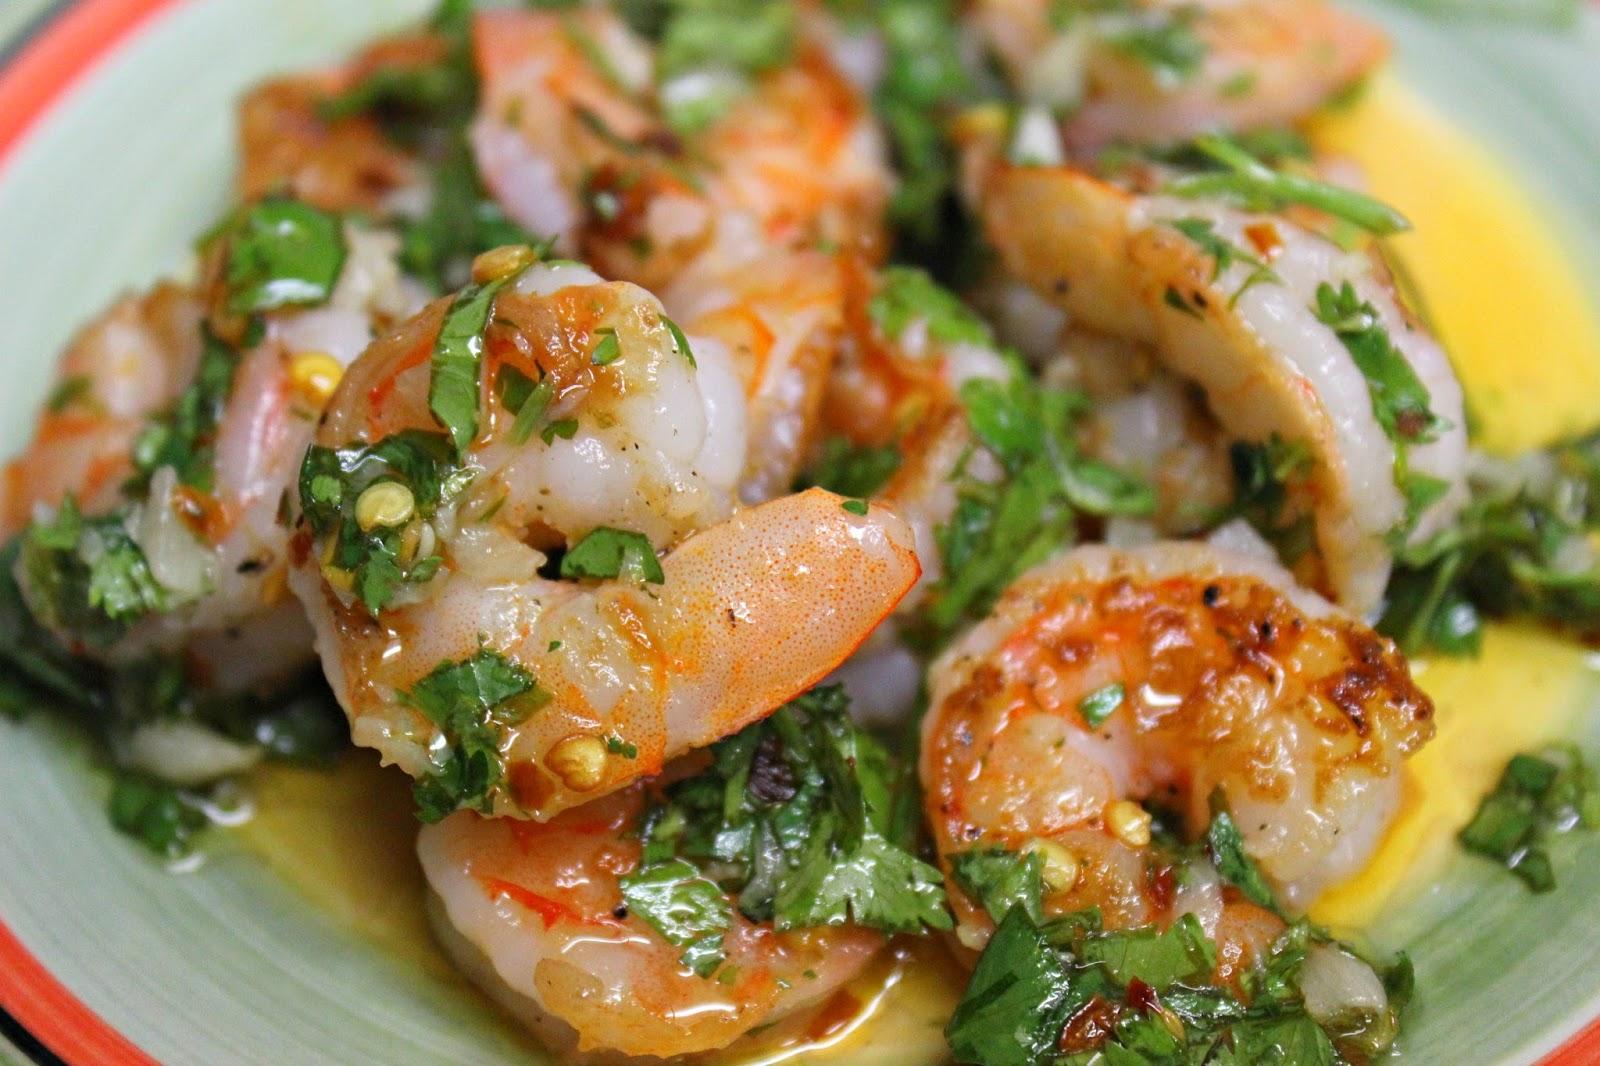 Grilled Shrimp With Garlic Cilantro Sauce A Bountiful Love